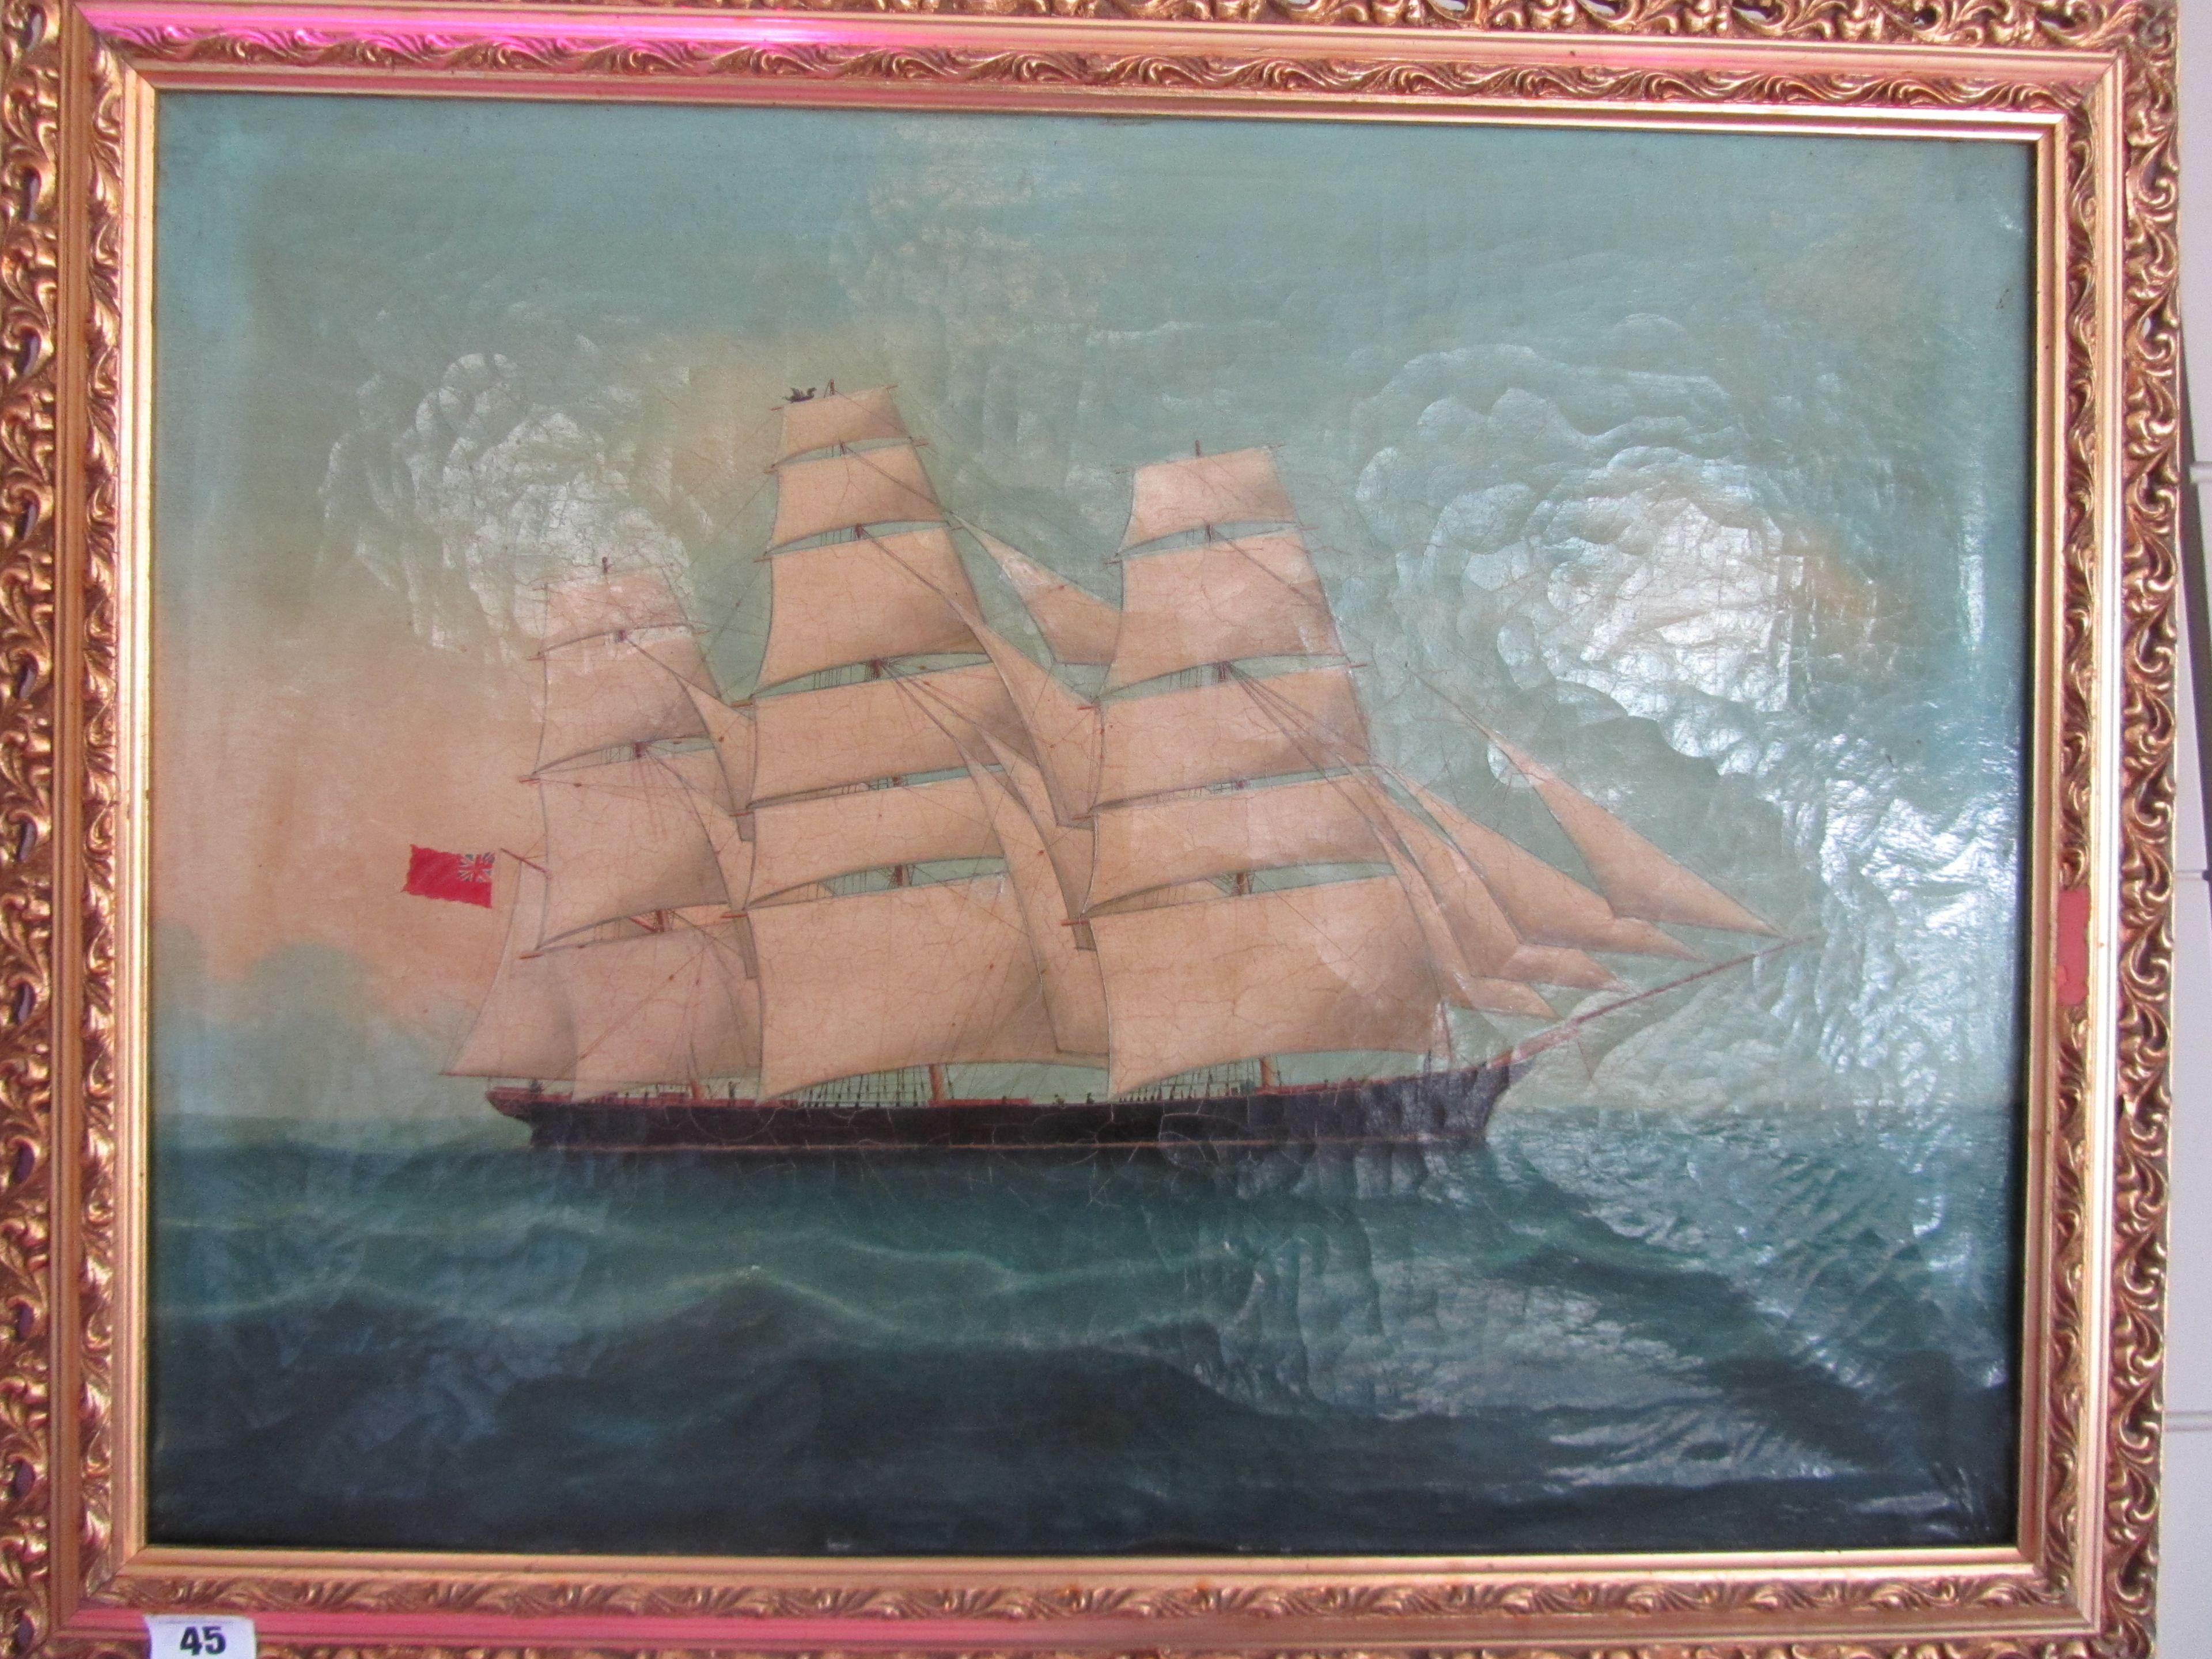 Lot 45 - Chinese School Third quarter 19th century 'Sir Lancelot' oil on canvas